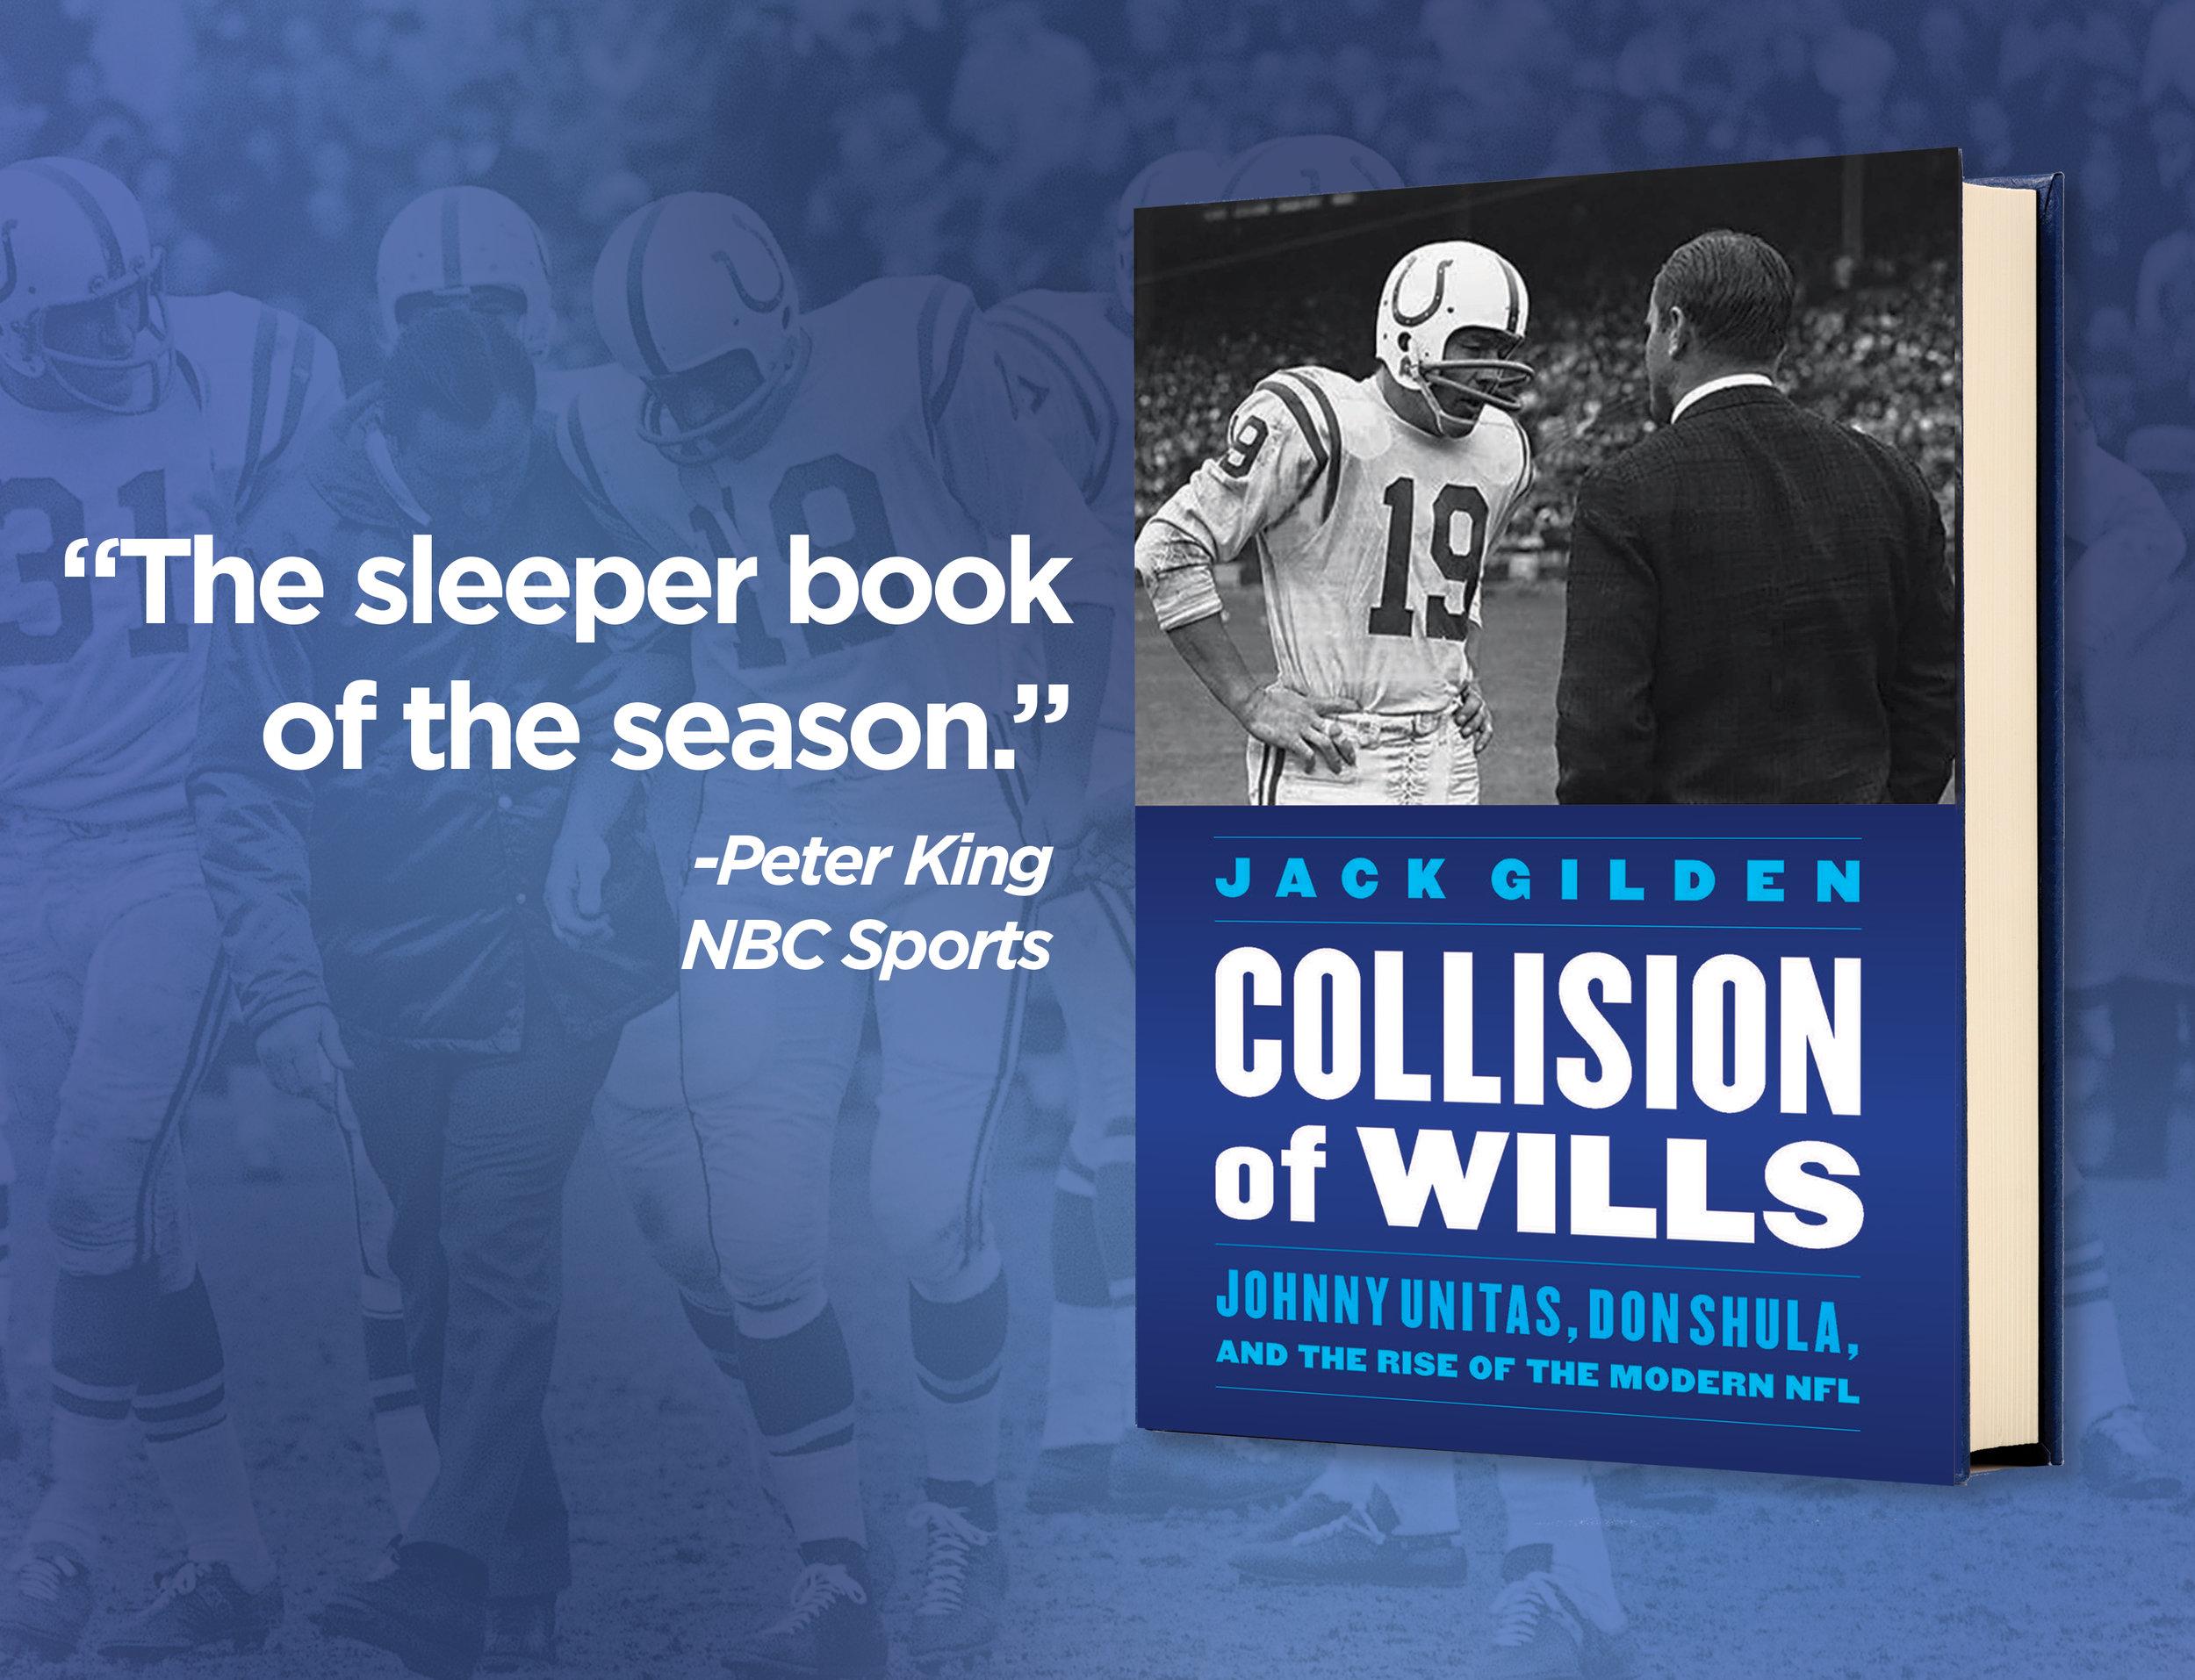 Gilden Collission of Wills10.jpg